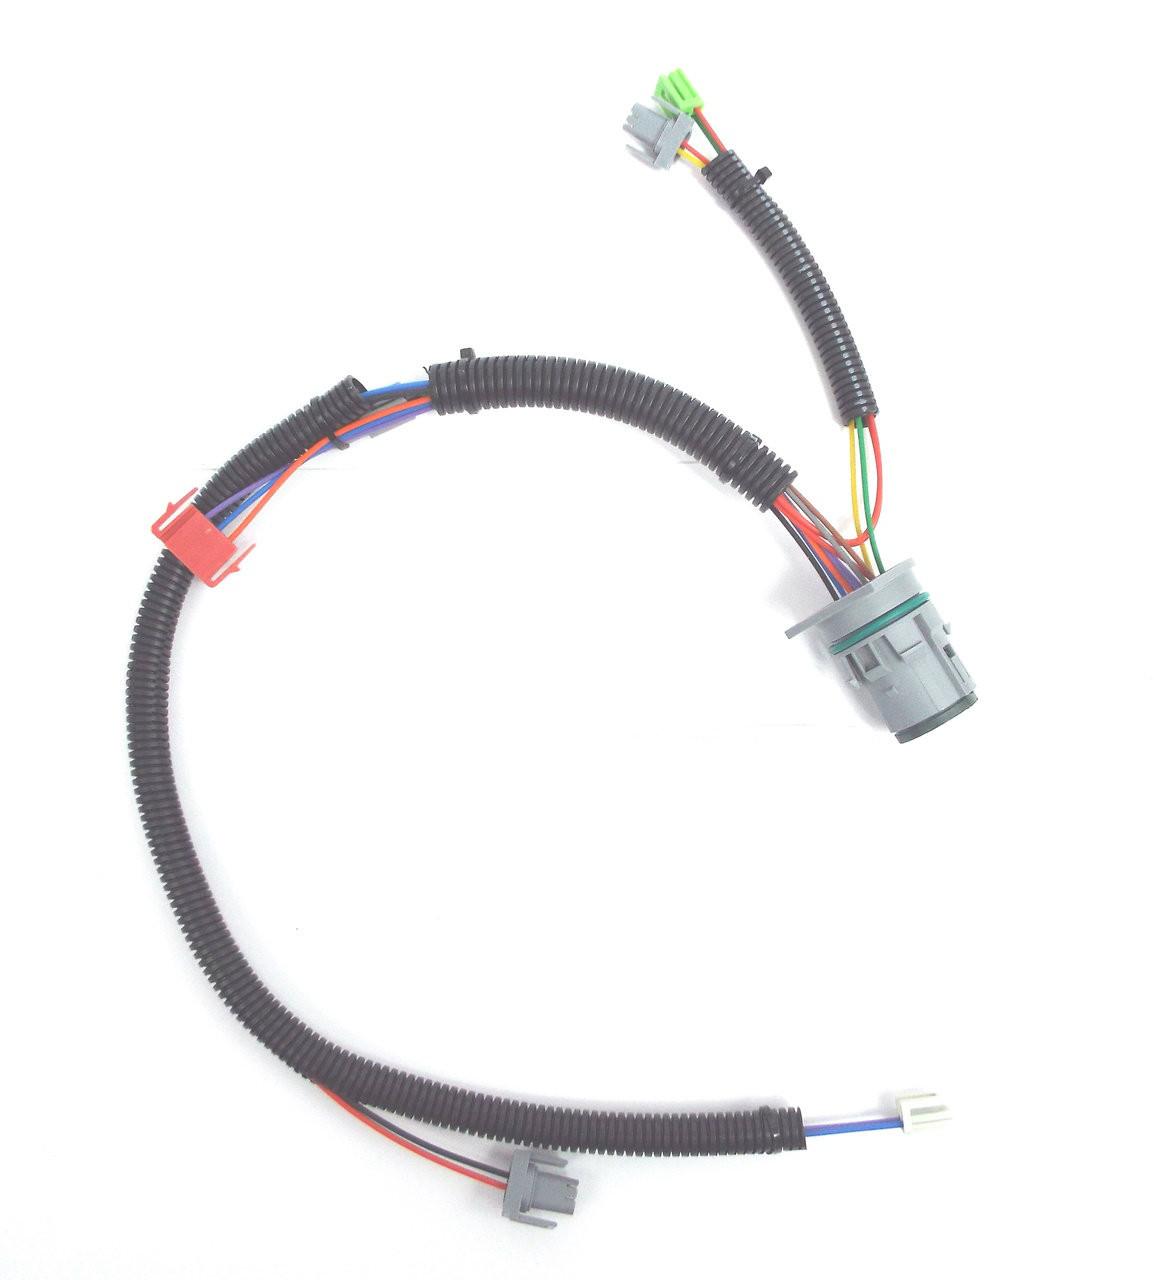 small resolution of 4l80e internal wiring harness 2004 up 24200161 global 4l80e wiring harness diagram 4l80e wiring harness